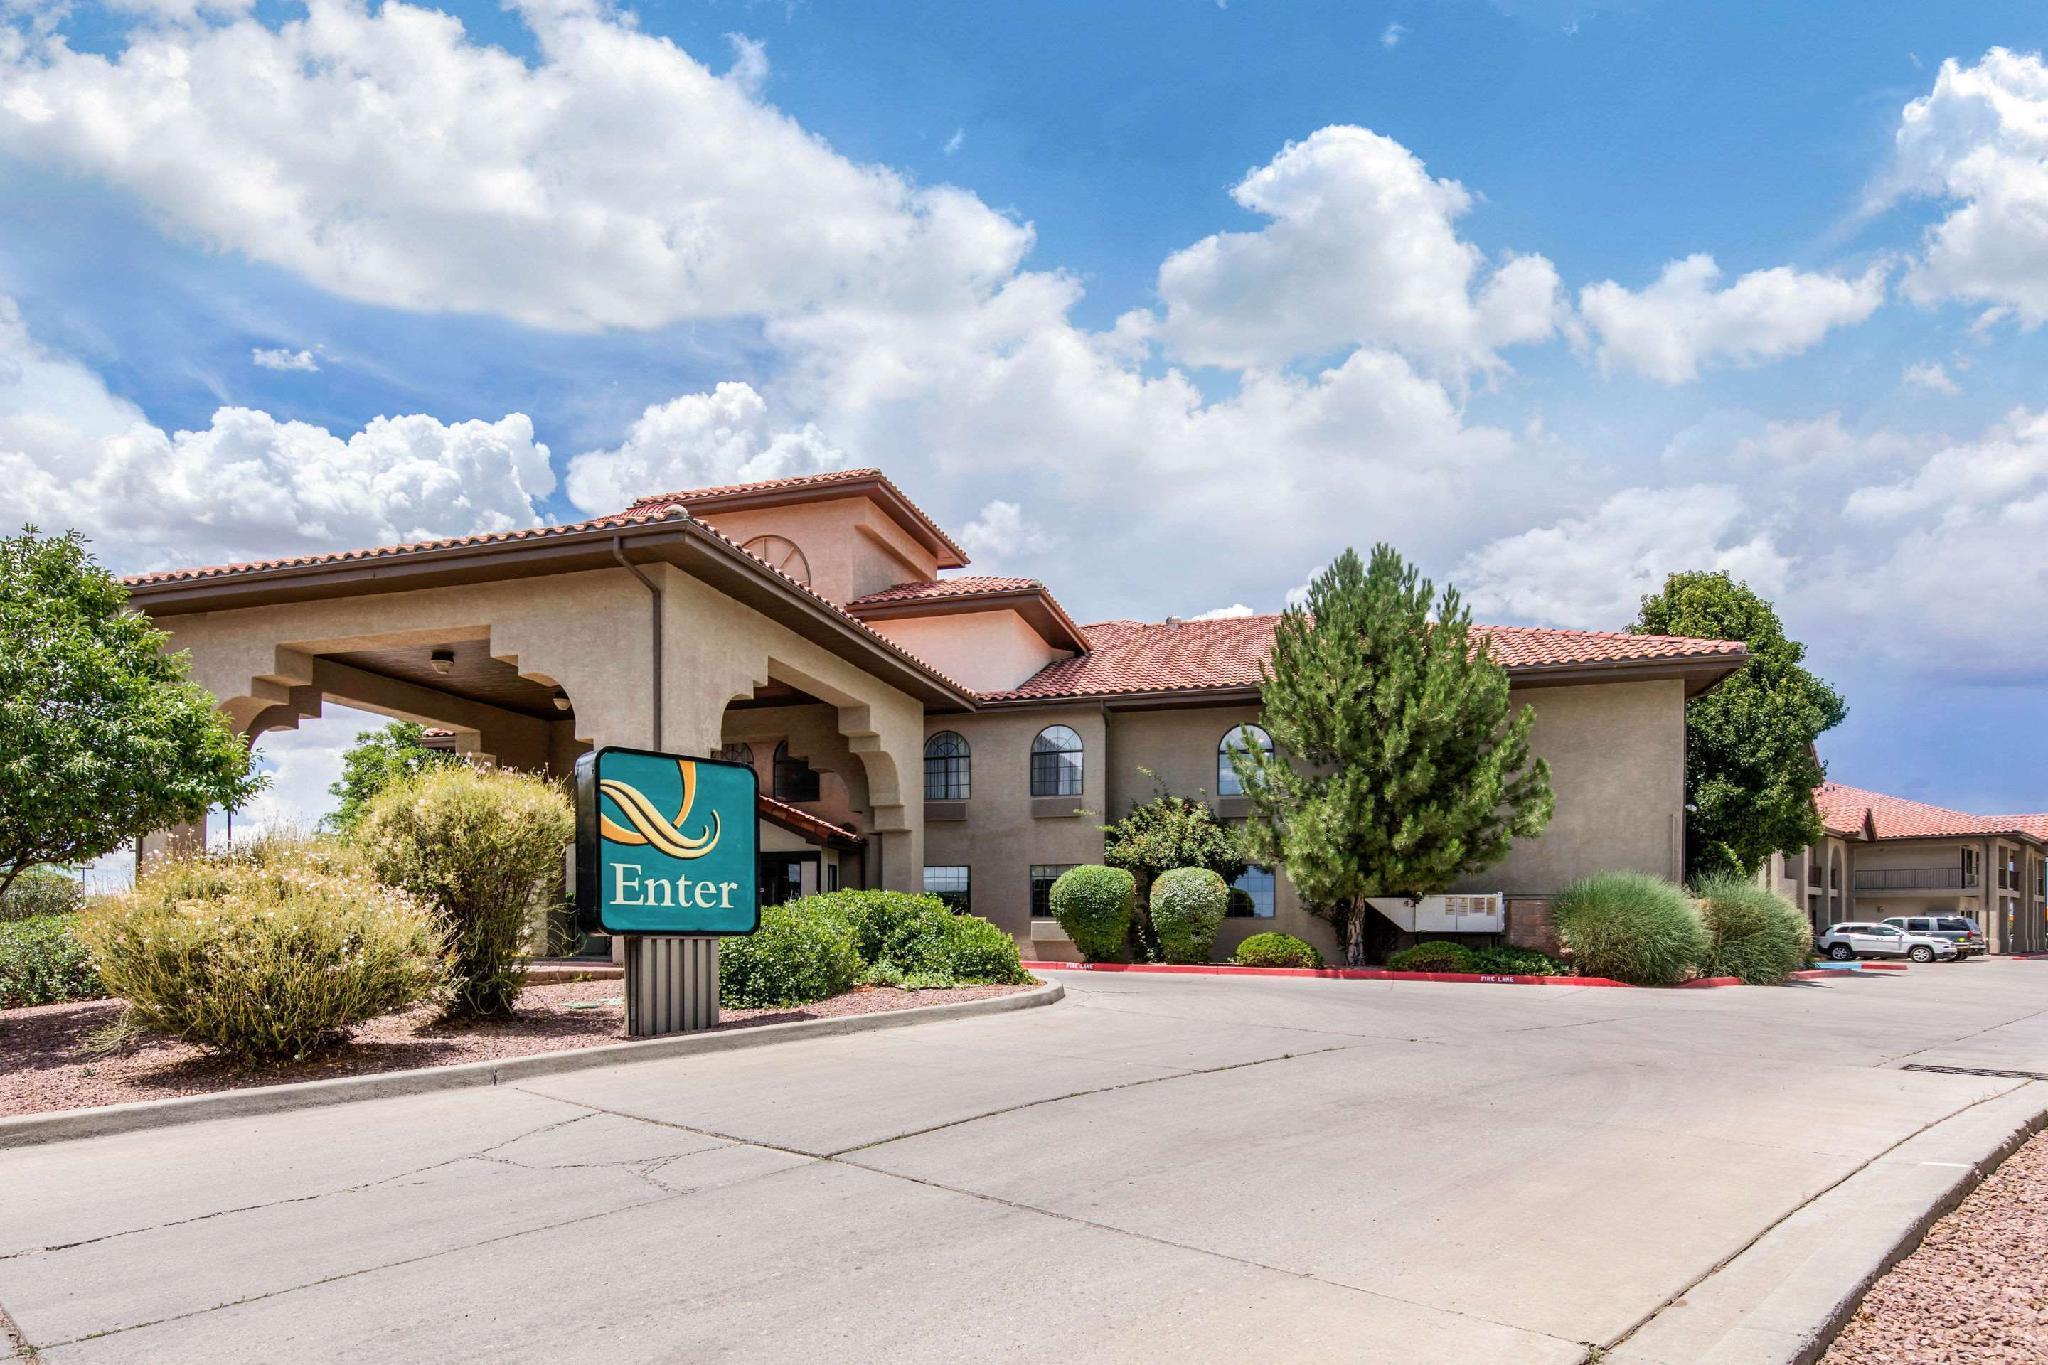 Quality Inn & Suites, McKinley